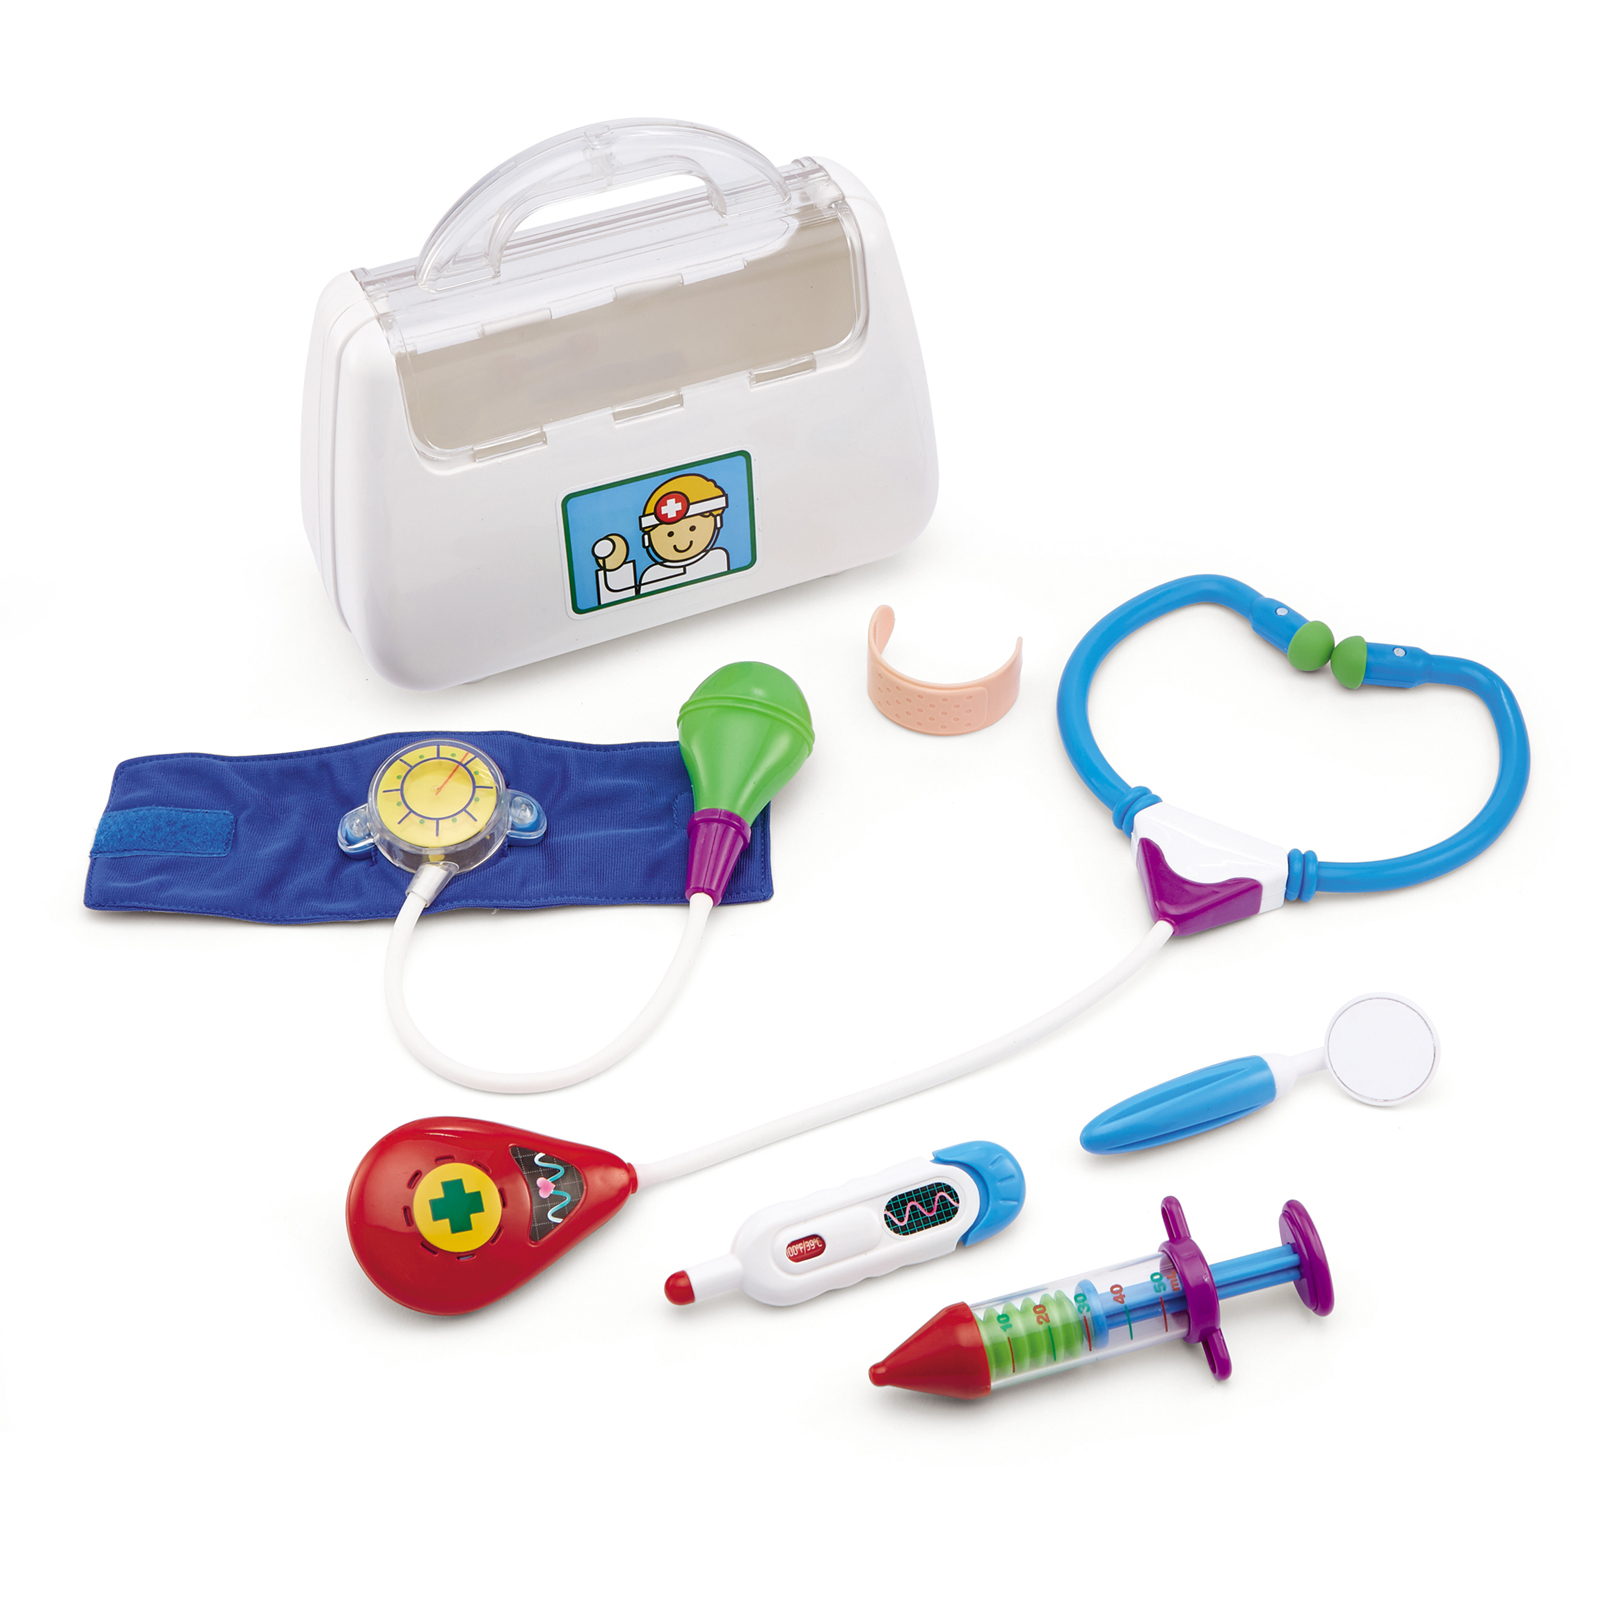 Toy Doctor Kit : International playthings kidoozie little doctor kit